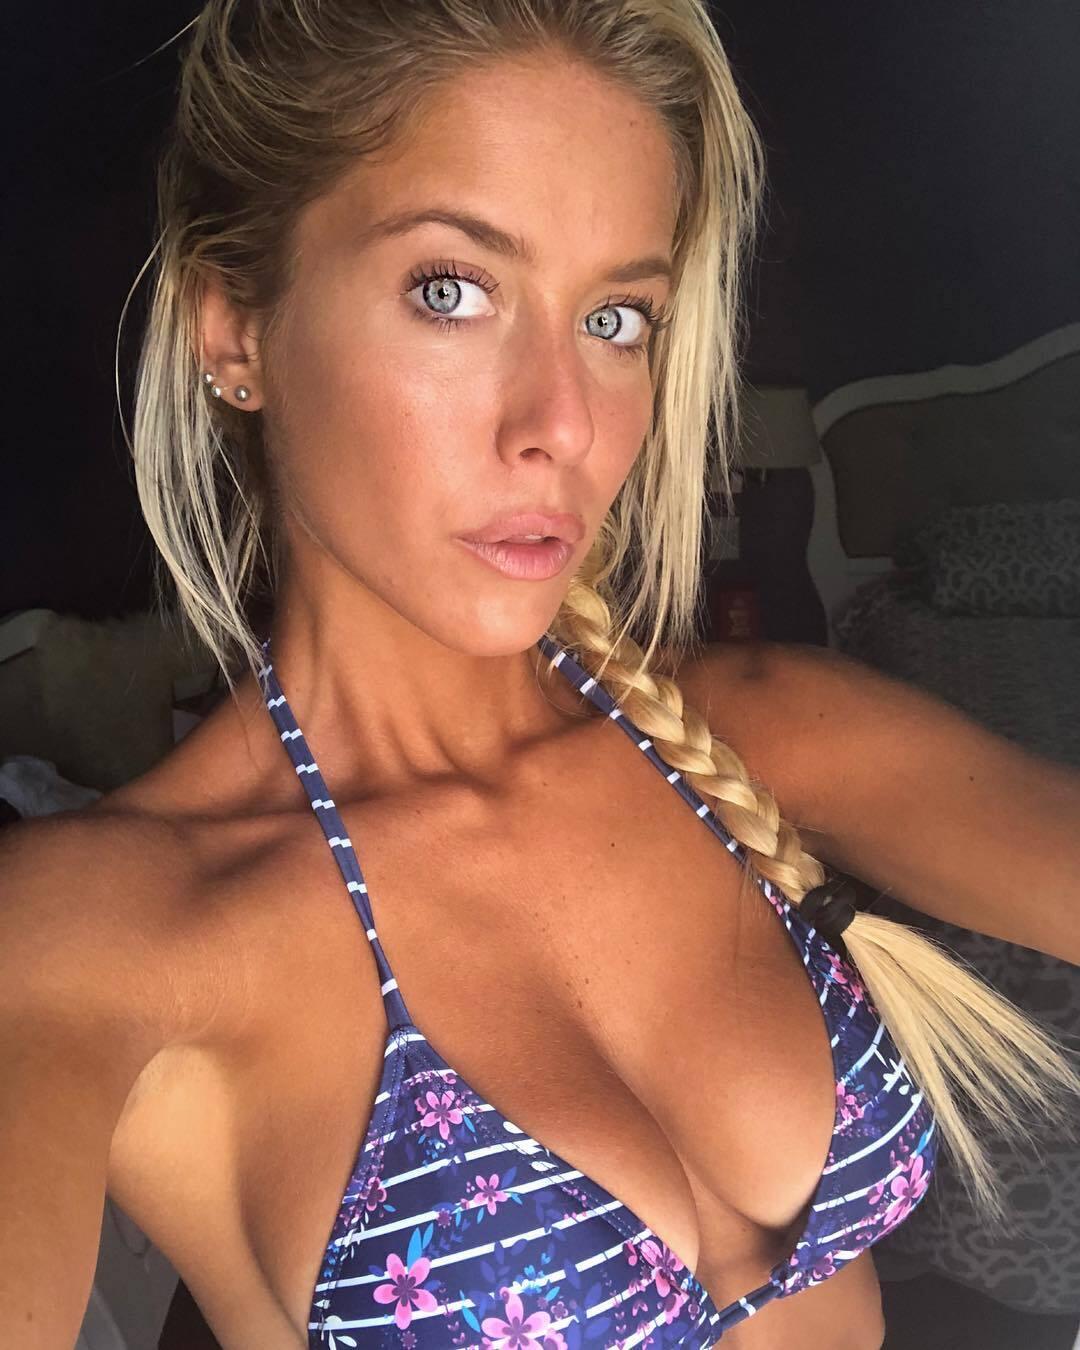 Антонелла Натале